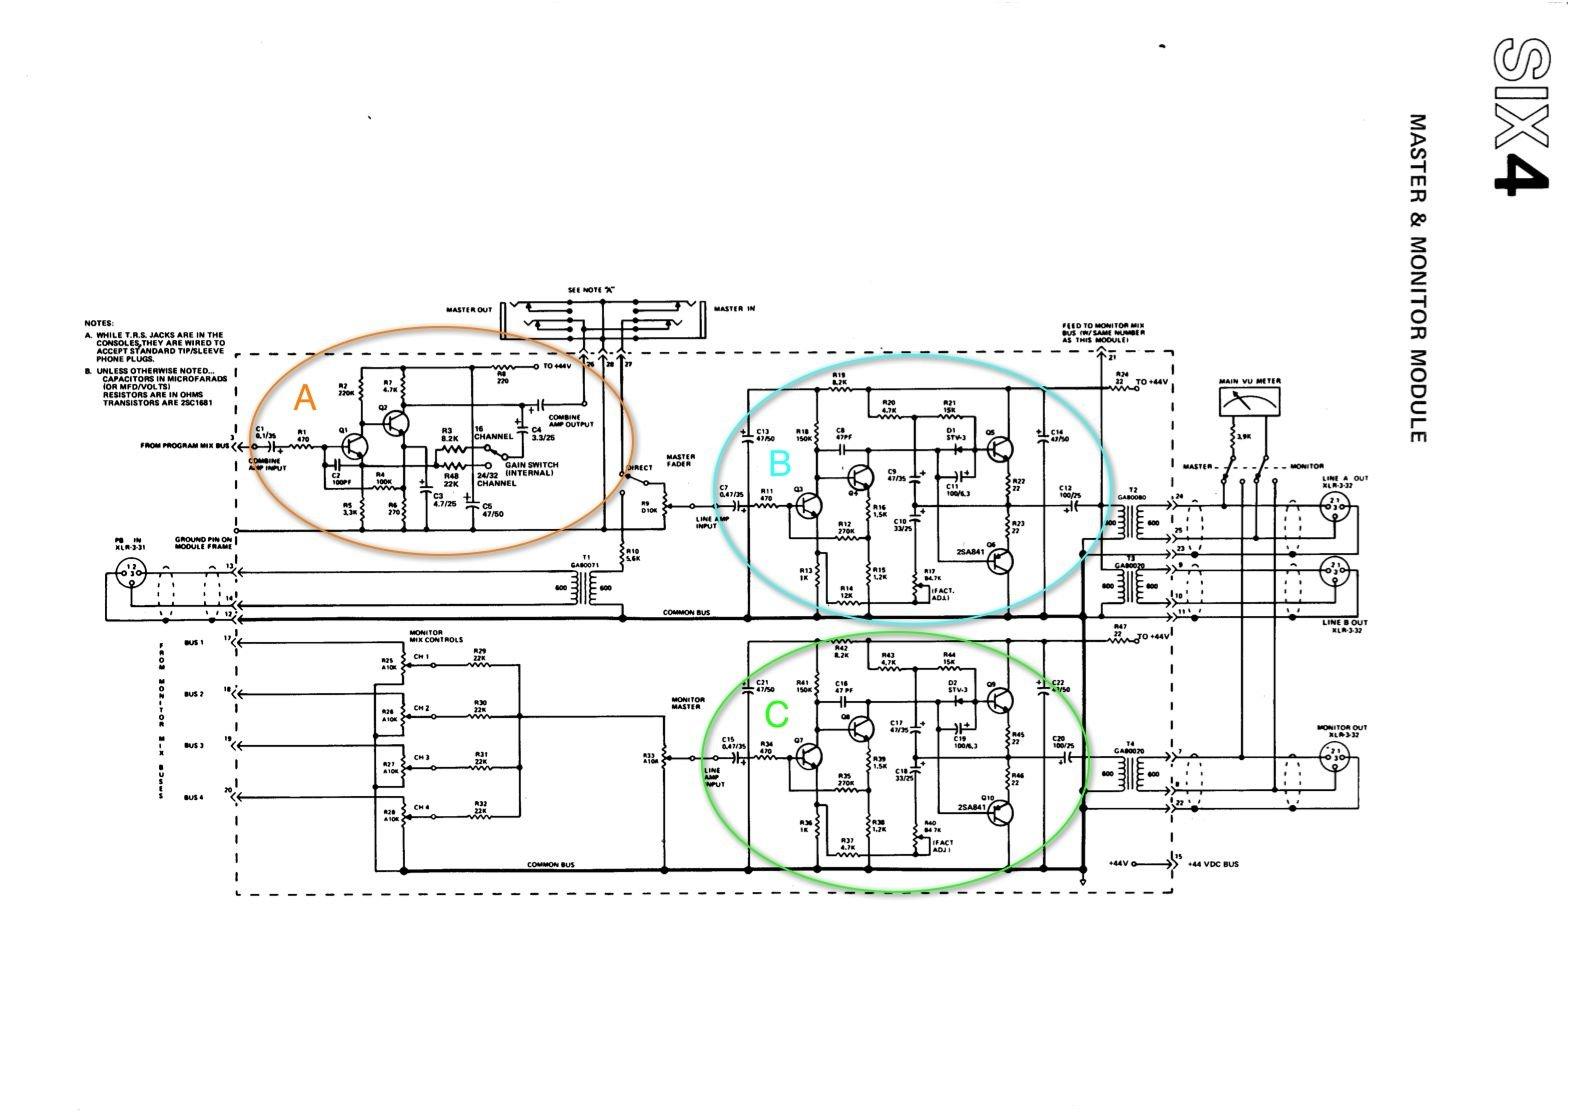 yamaha pm-1000  full mixer  output module question